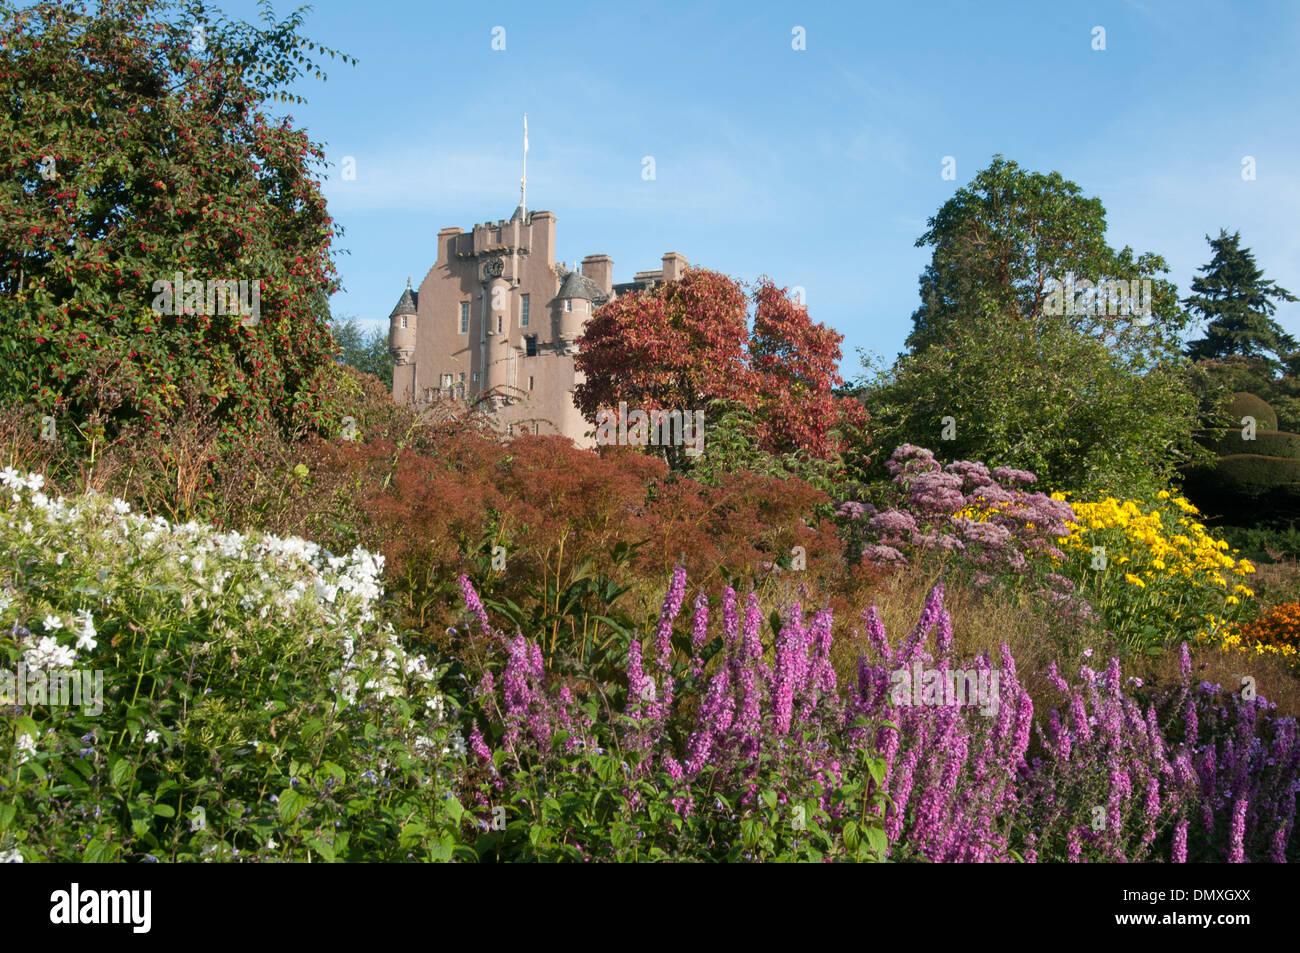 Flowers Garden Stock Photos & Flowers Garden Stock Images - Alamy